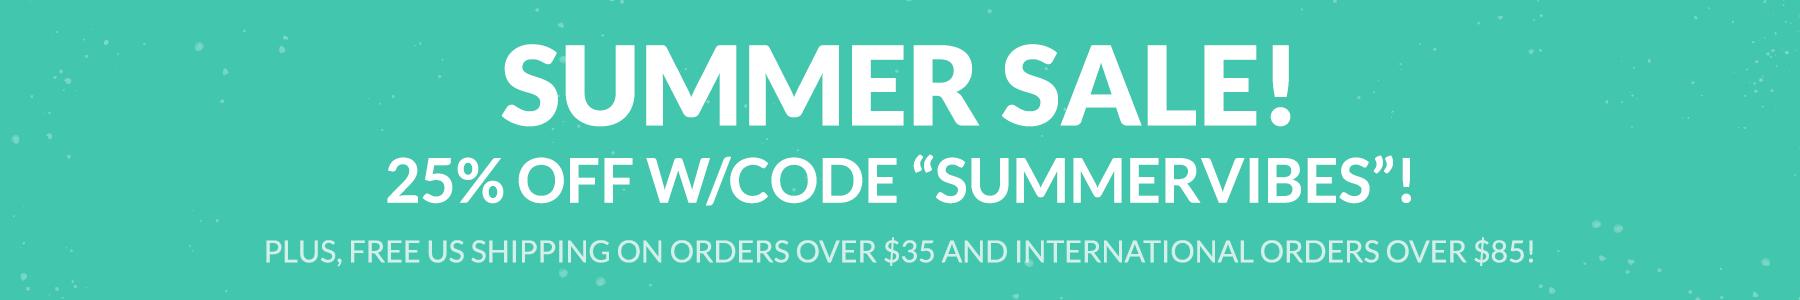 Summer Vibes Sale